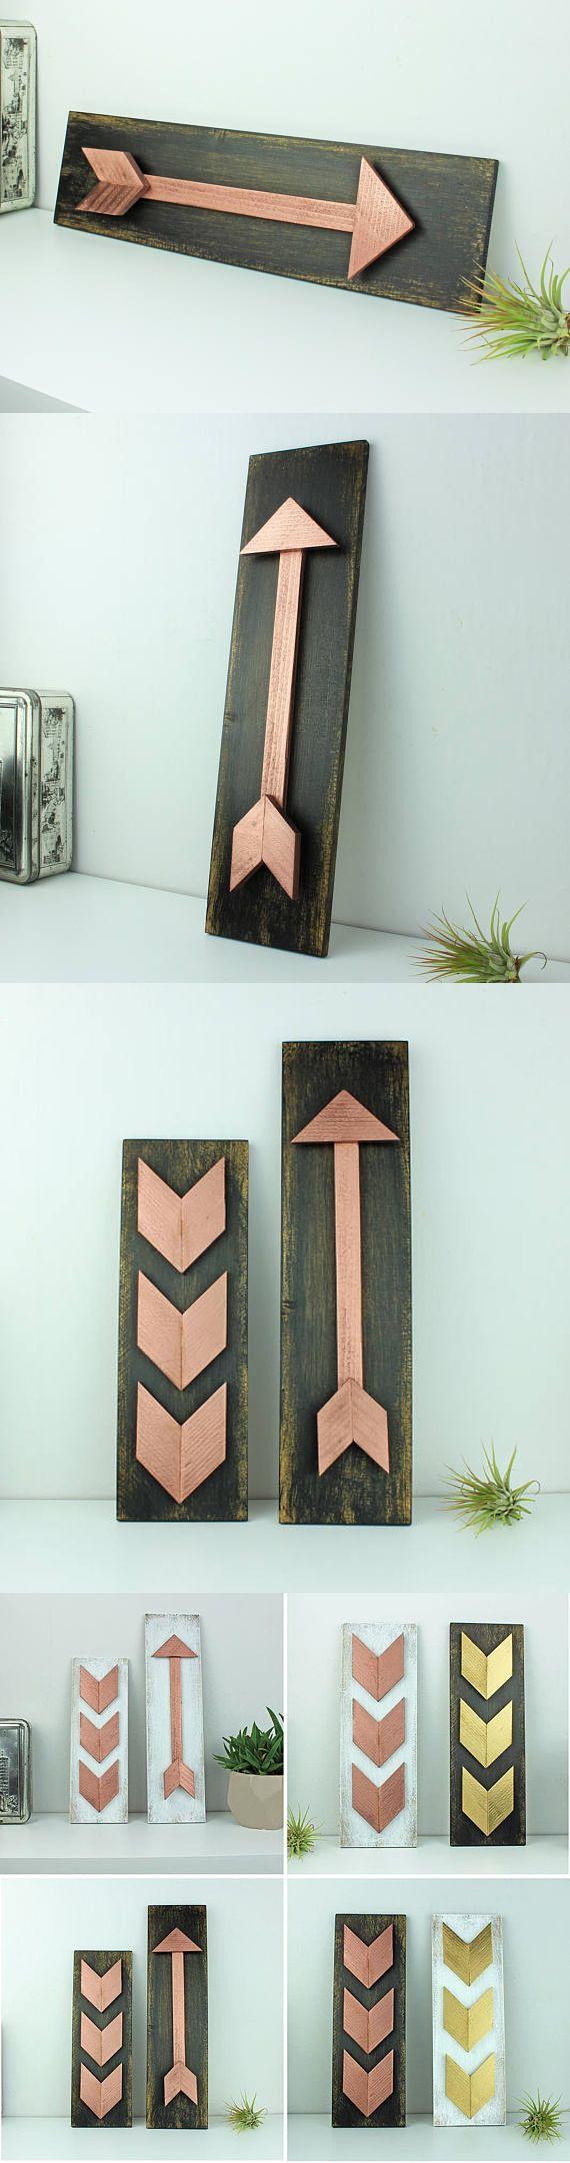 Boho Wohnkultur, Rose gold Pfeil-Wand-Kunst, moderne Pfeil-Symbol ...